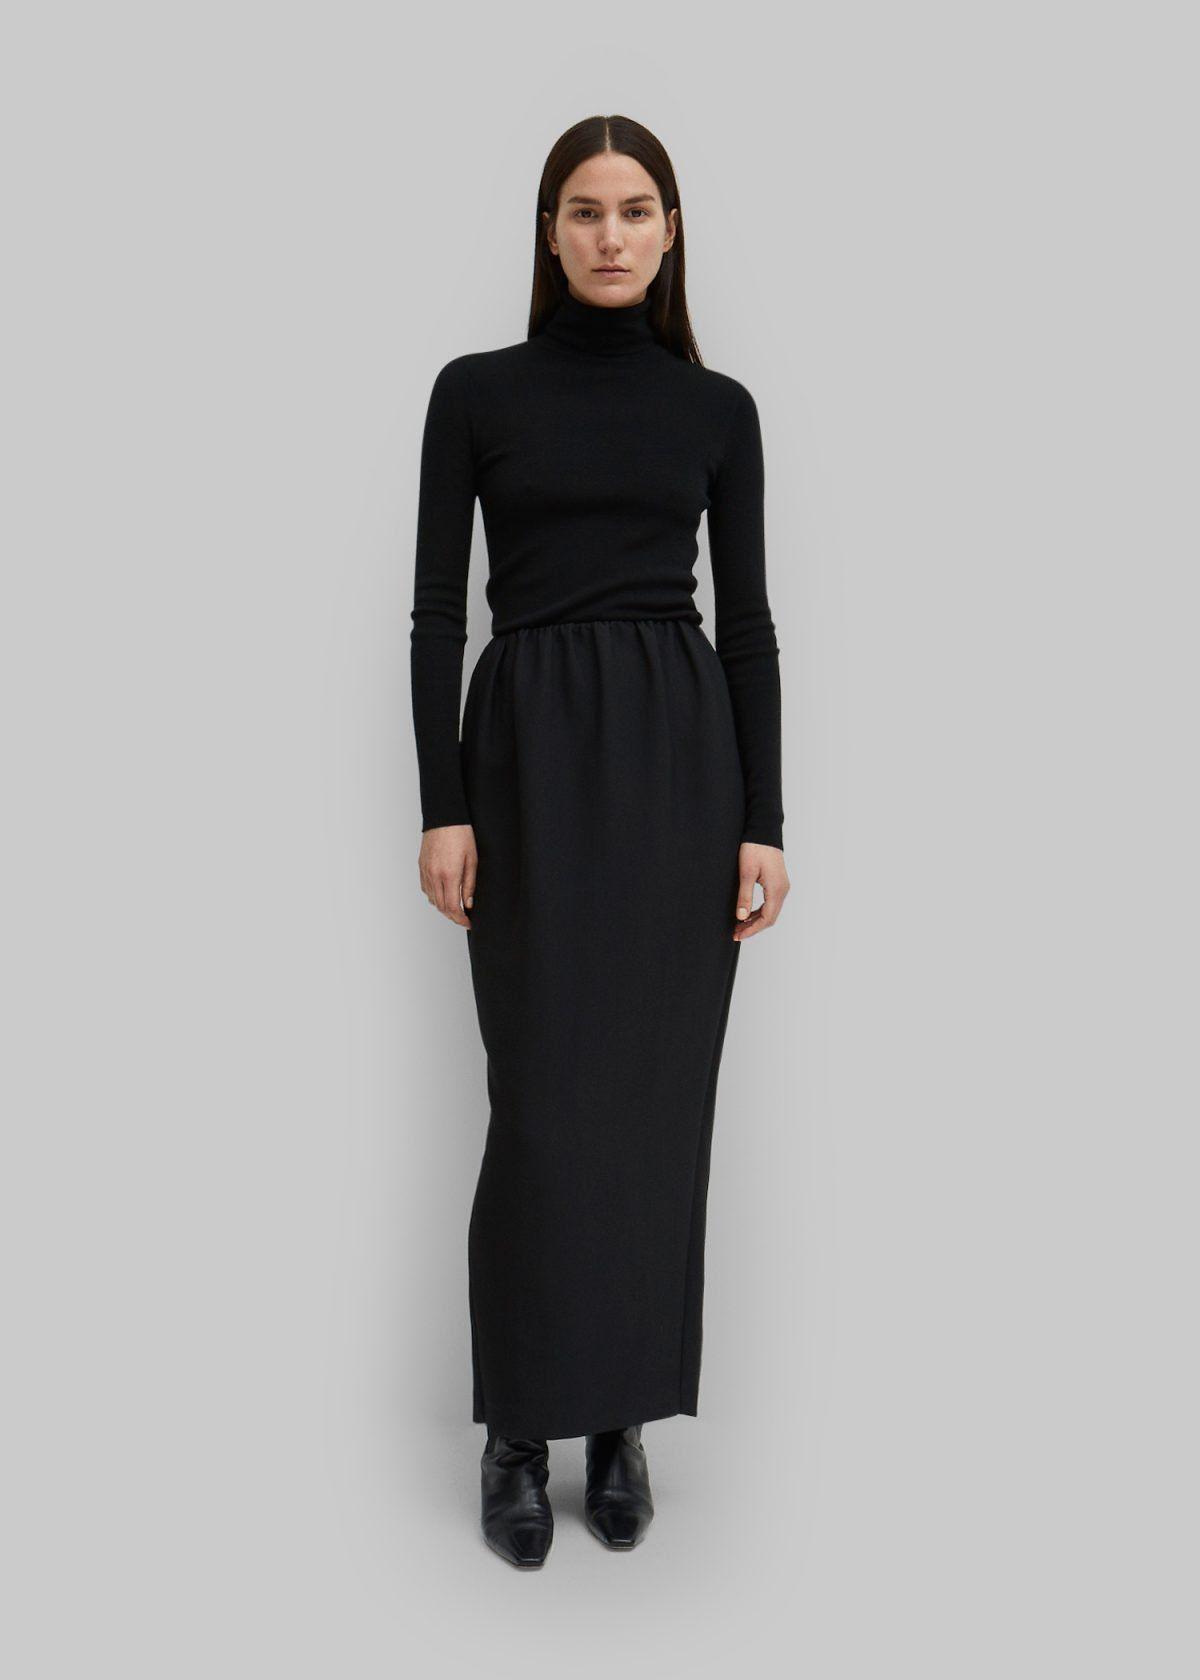 Dresses Skirts Skirts Evening Skirts Dress Skirt [ 1680 x 1200 Pixel ]